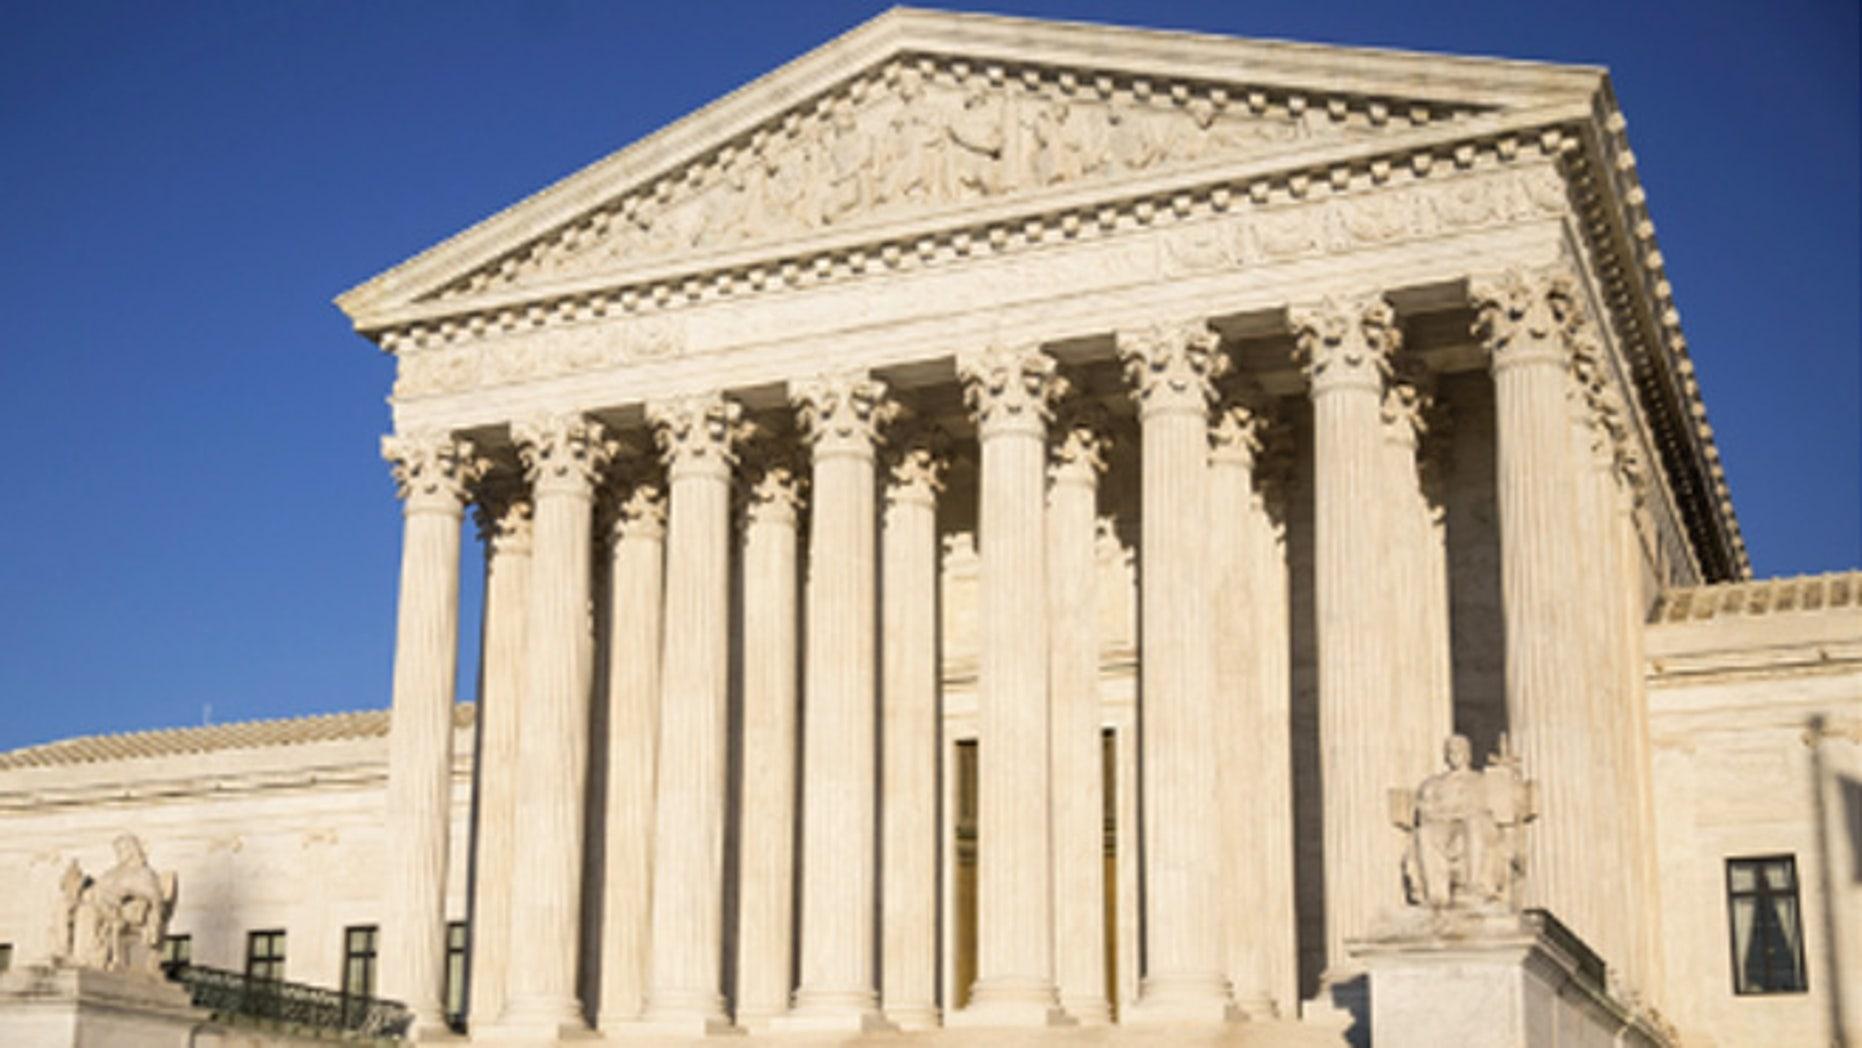 March 2, 2015: The U.S. Supreme Court in Washington, D.C.